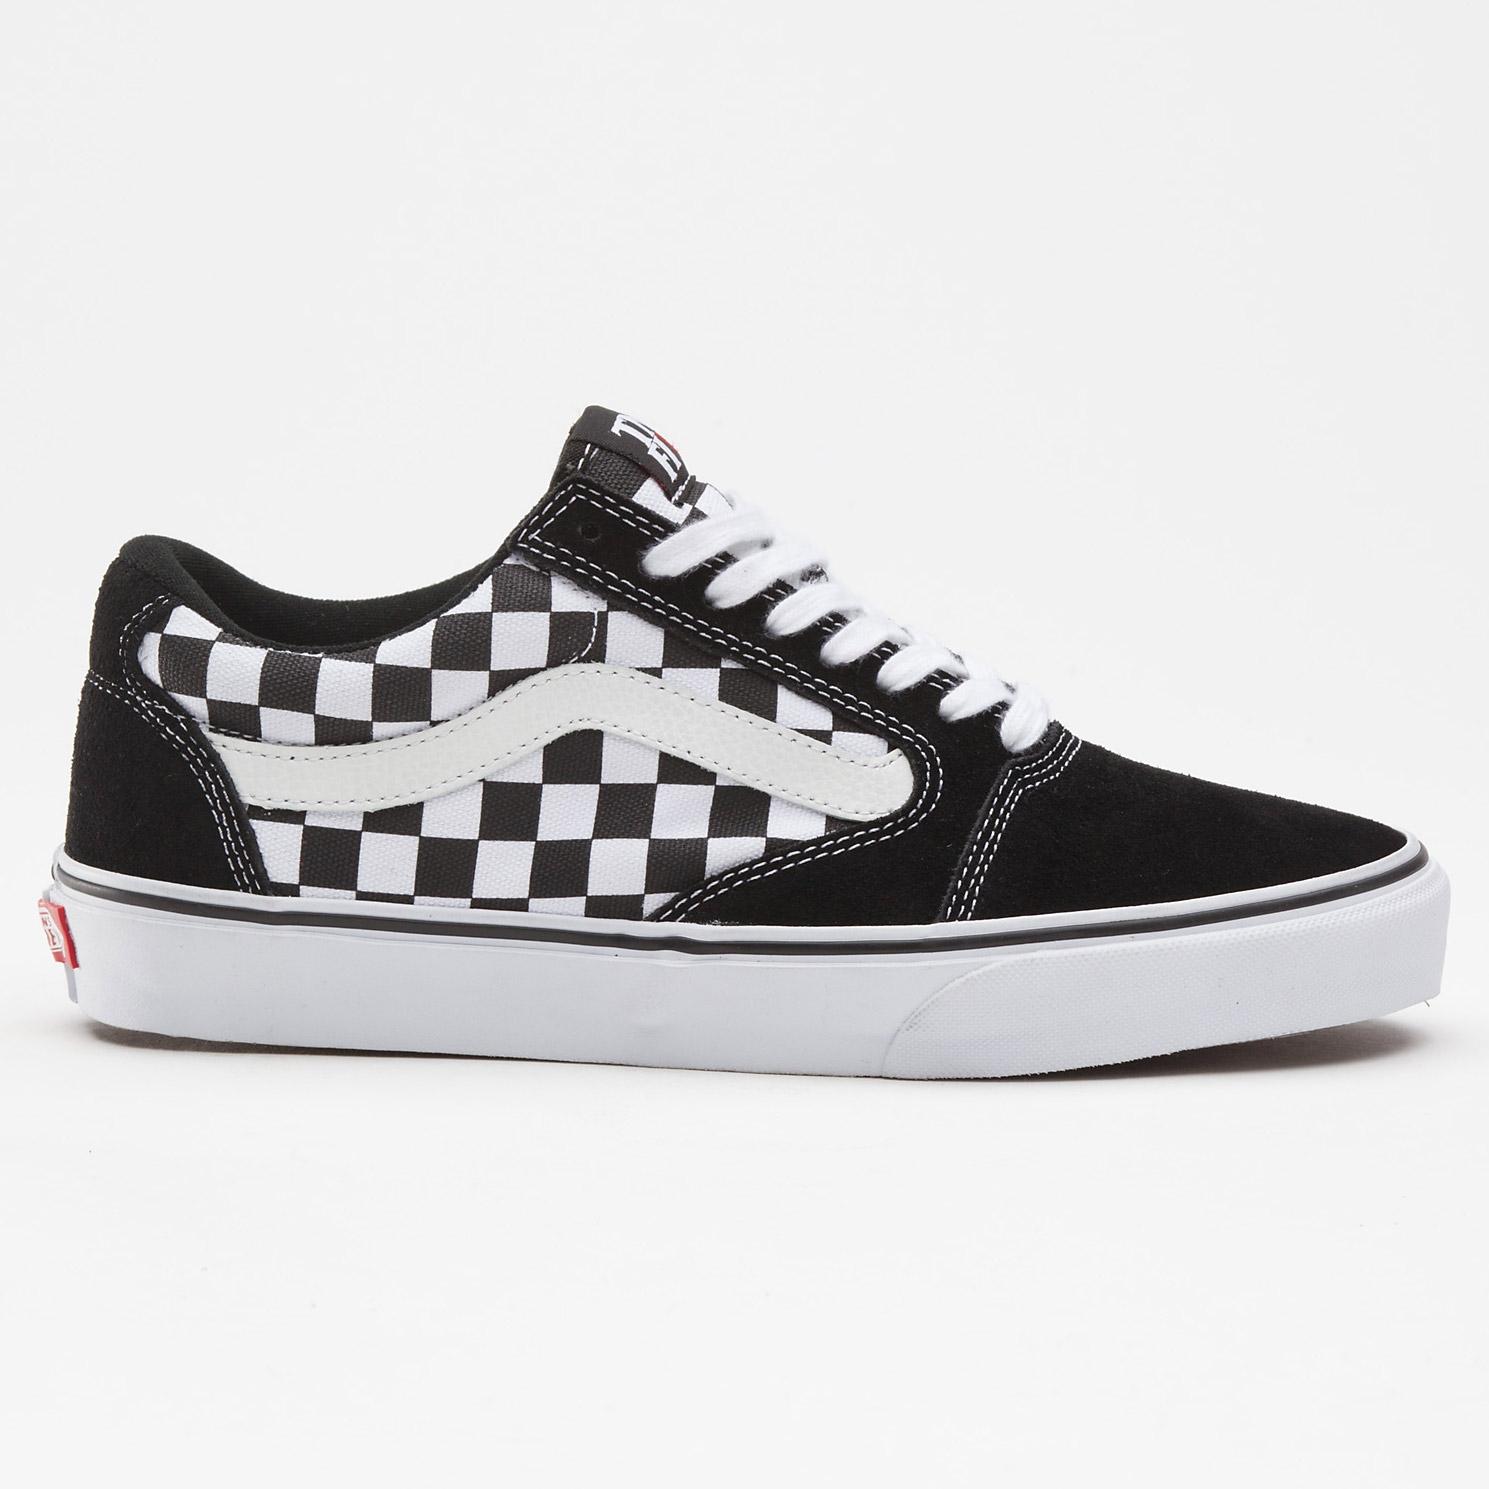 96debfa452a6 Vans Tnt 5 checkerboard black white